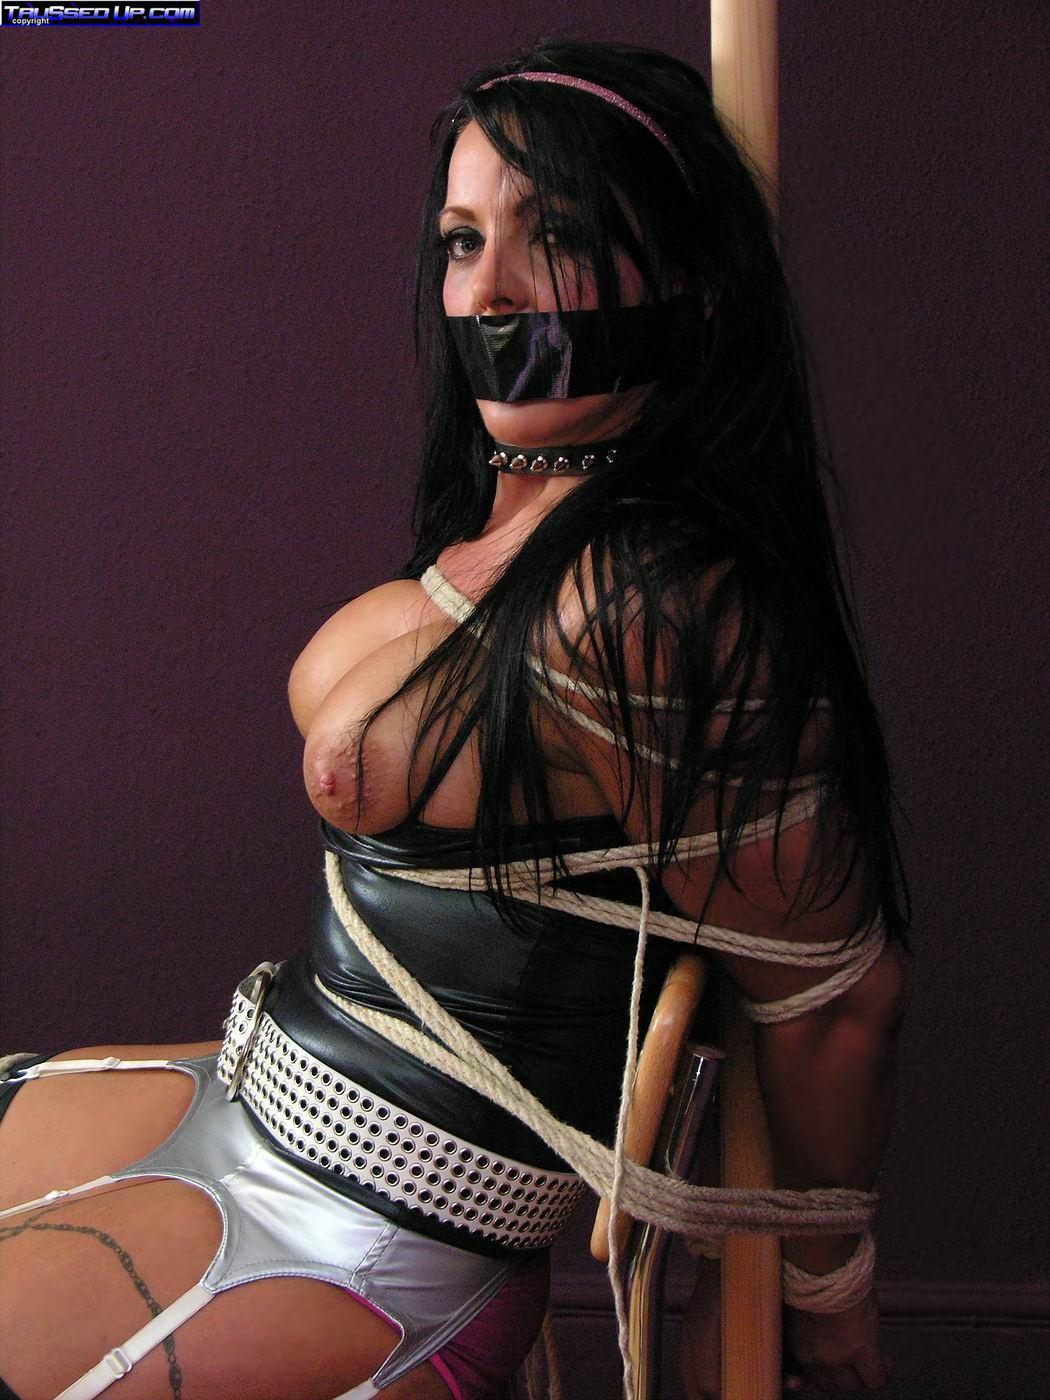 New girls in bondage